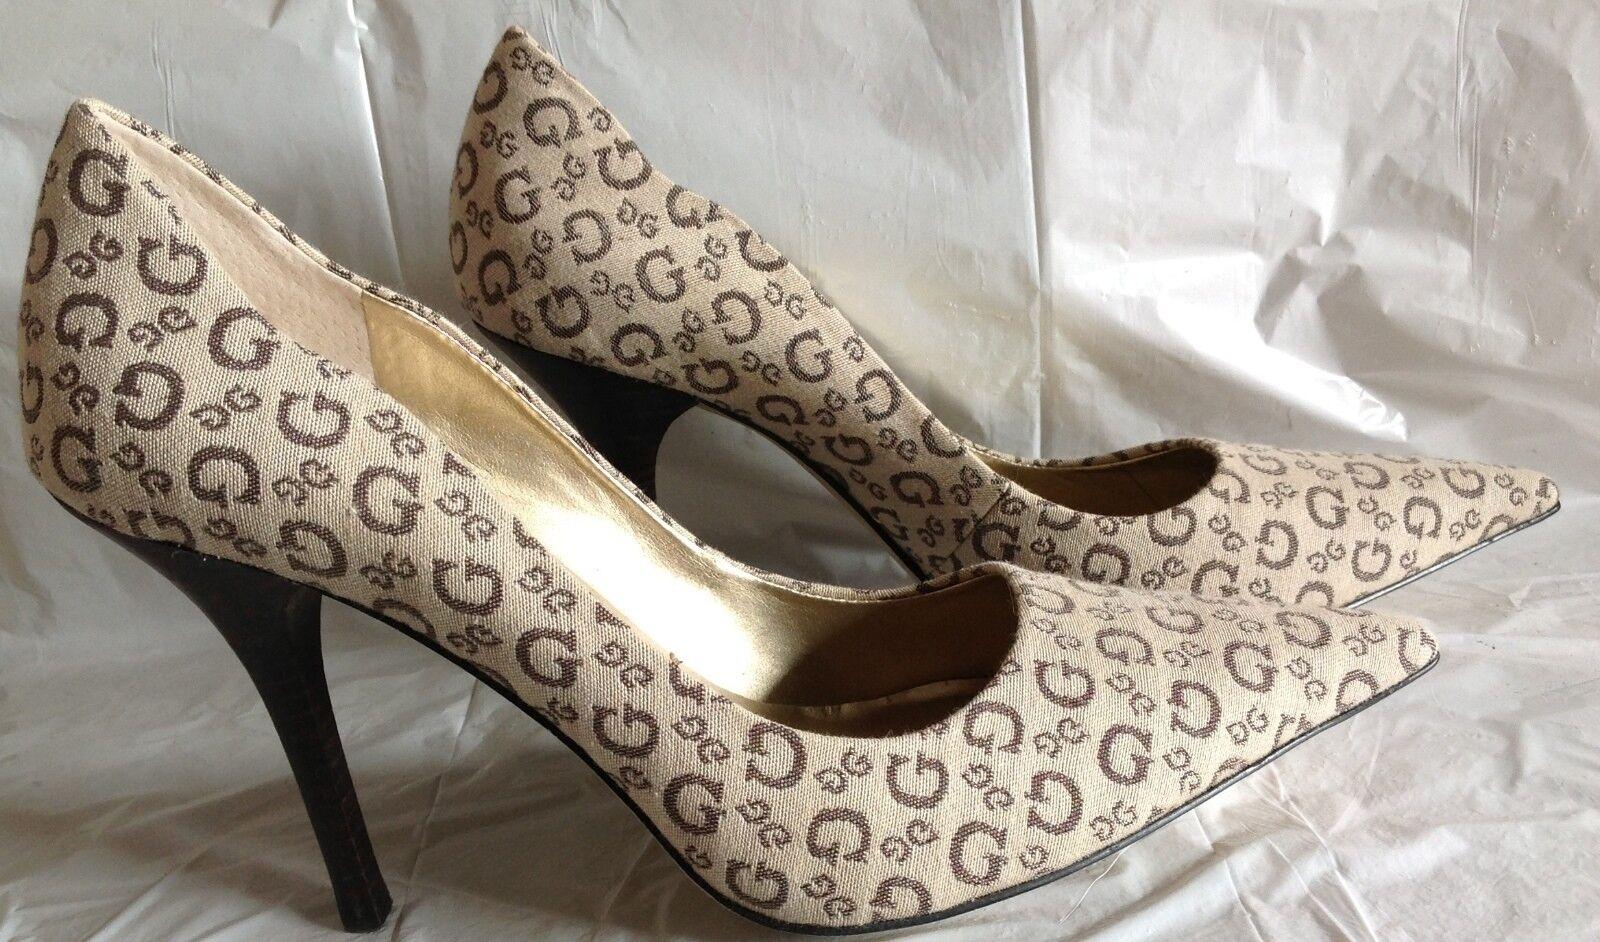 NWOB, Guess heels, Loren 2, cream canvas brown logo G G G design,sizes 6M or (2)7.5M a50c62